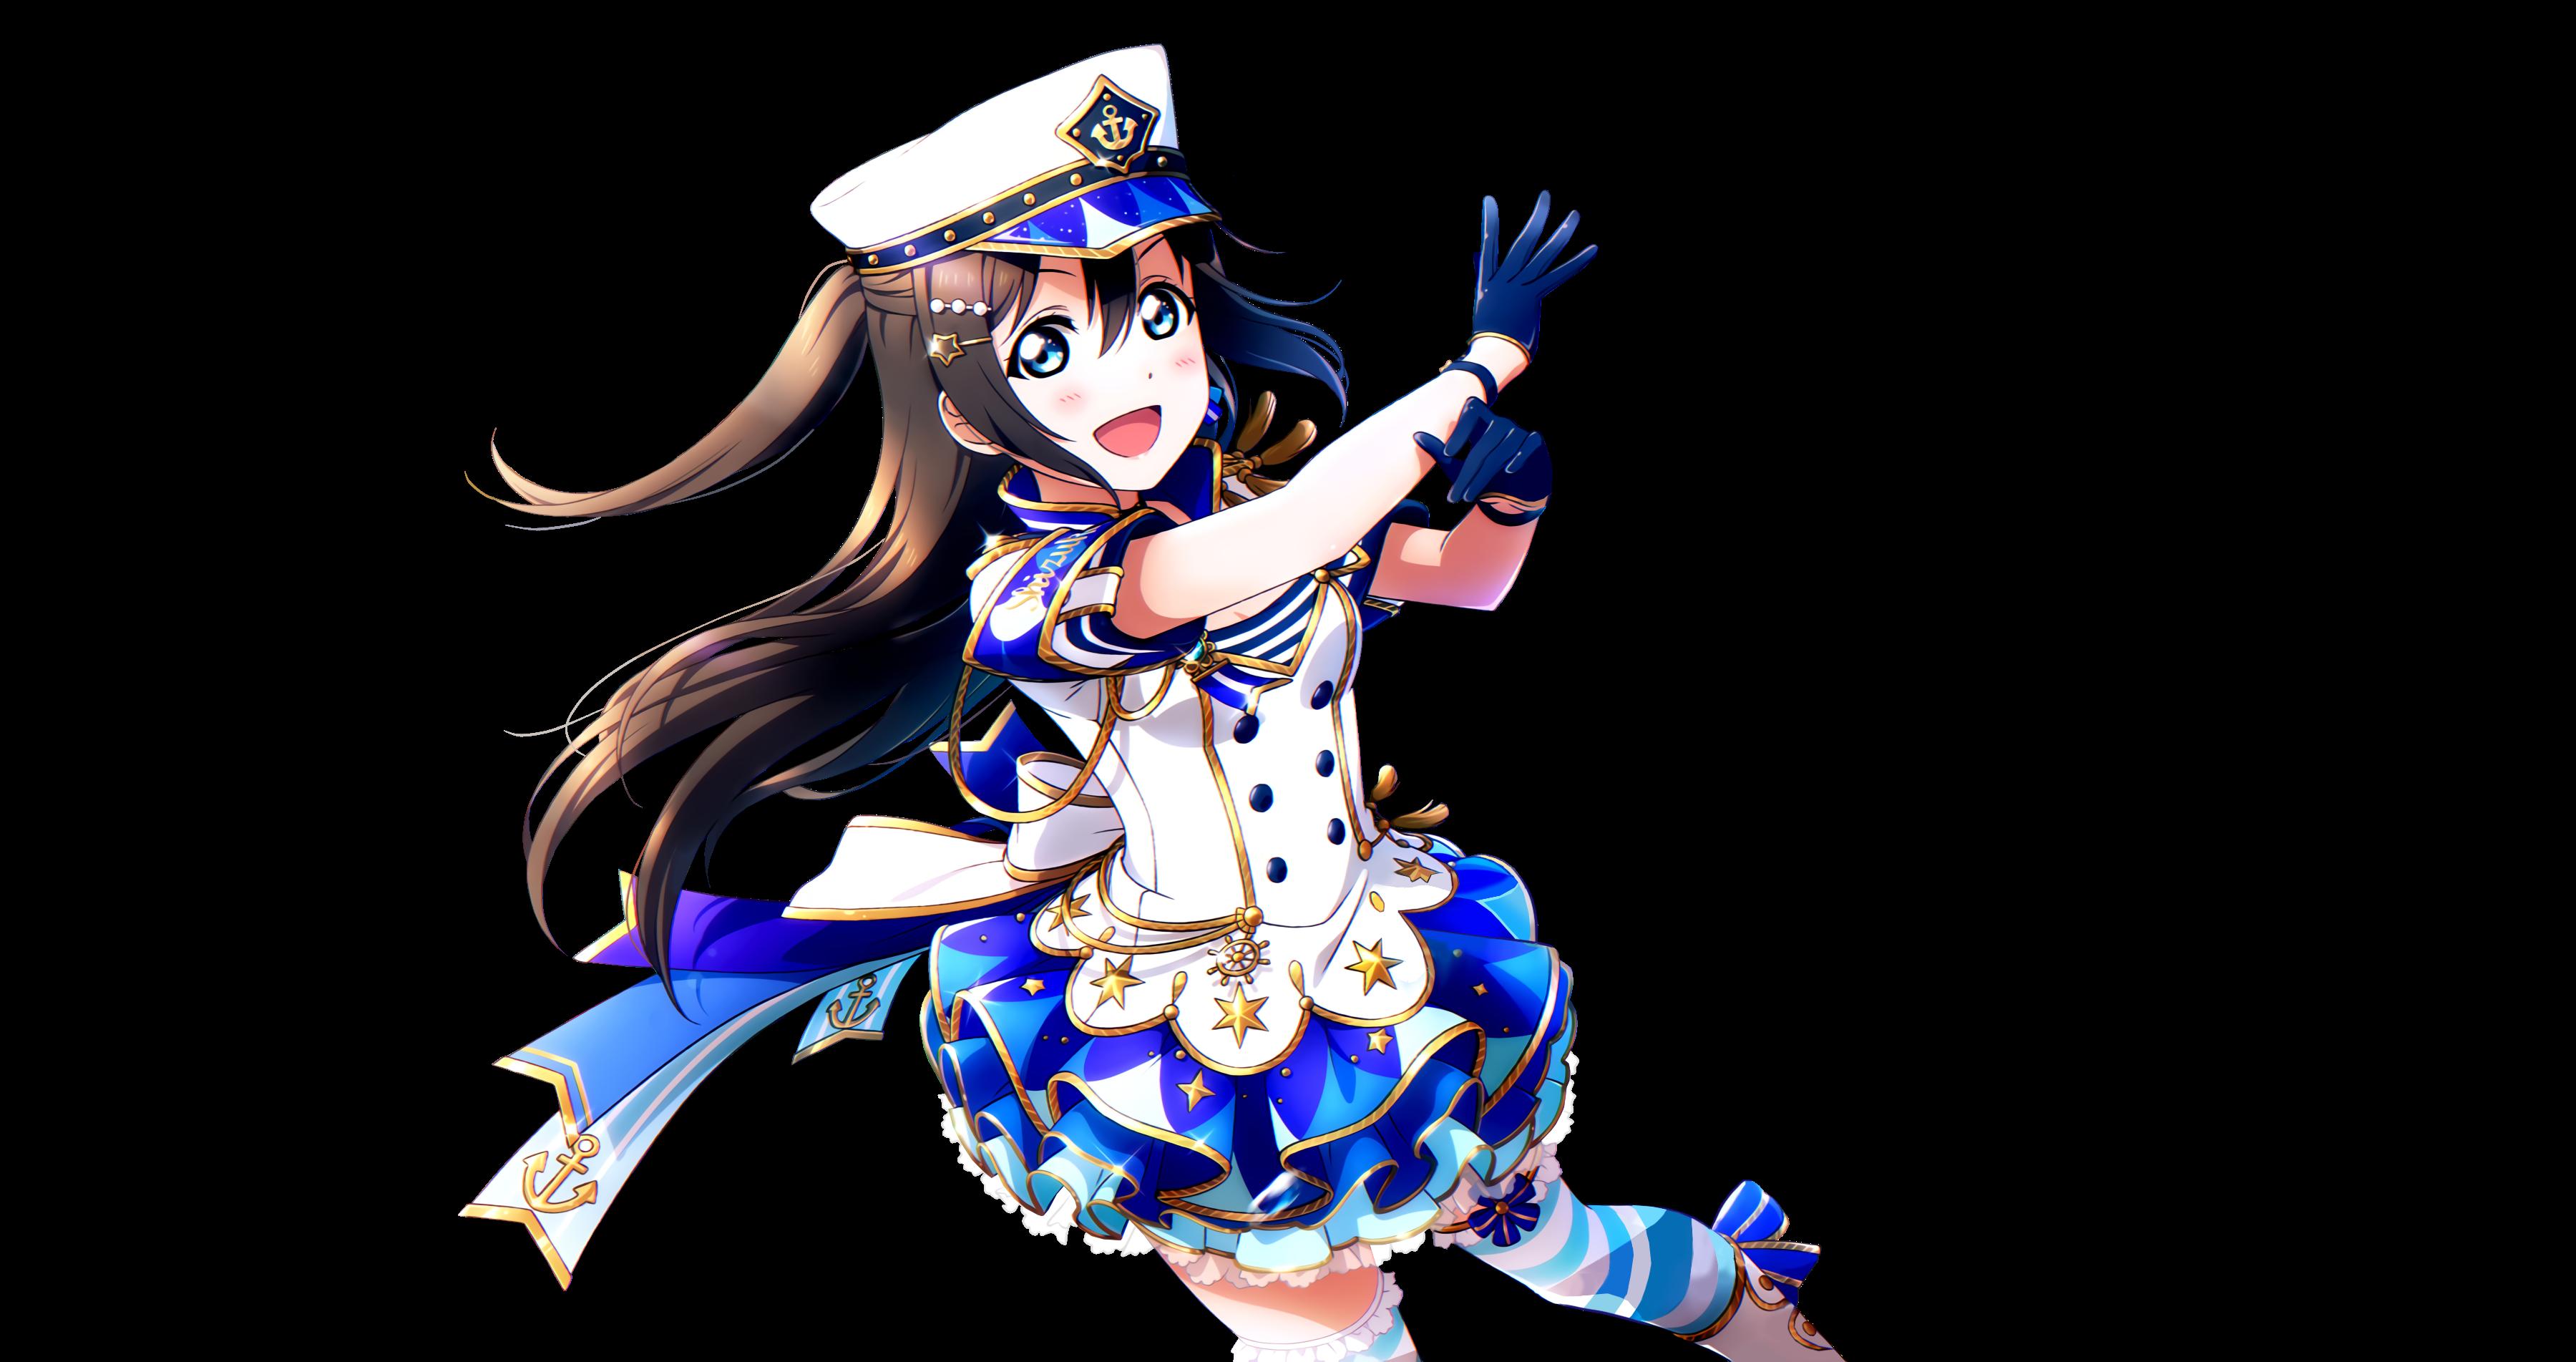 Ur Osaka Shizuku I Cannot Afford To Slip Here Miracle Voyage Cards List All Stars Idol Story Love Live